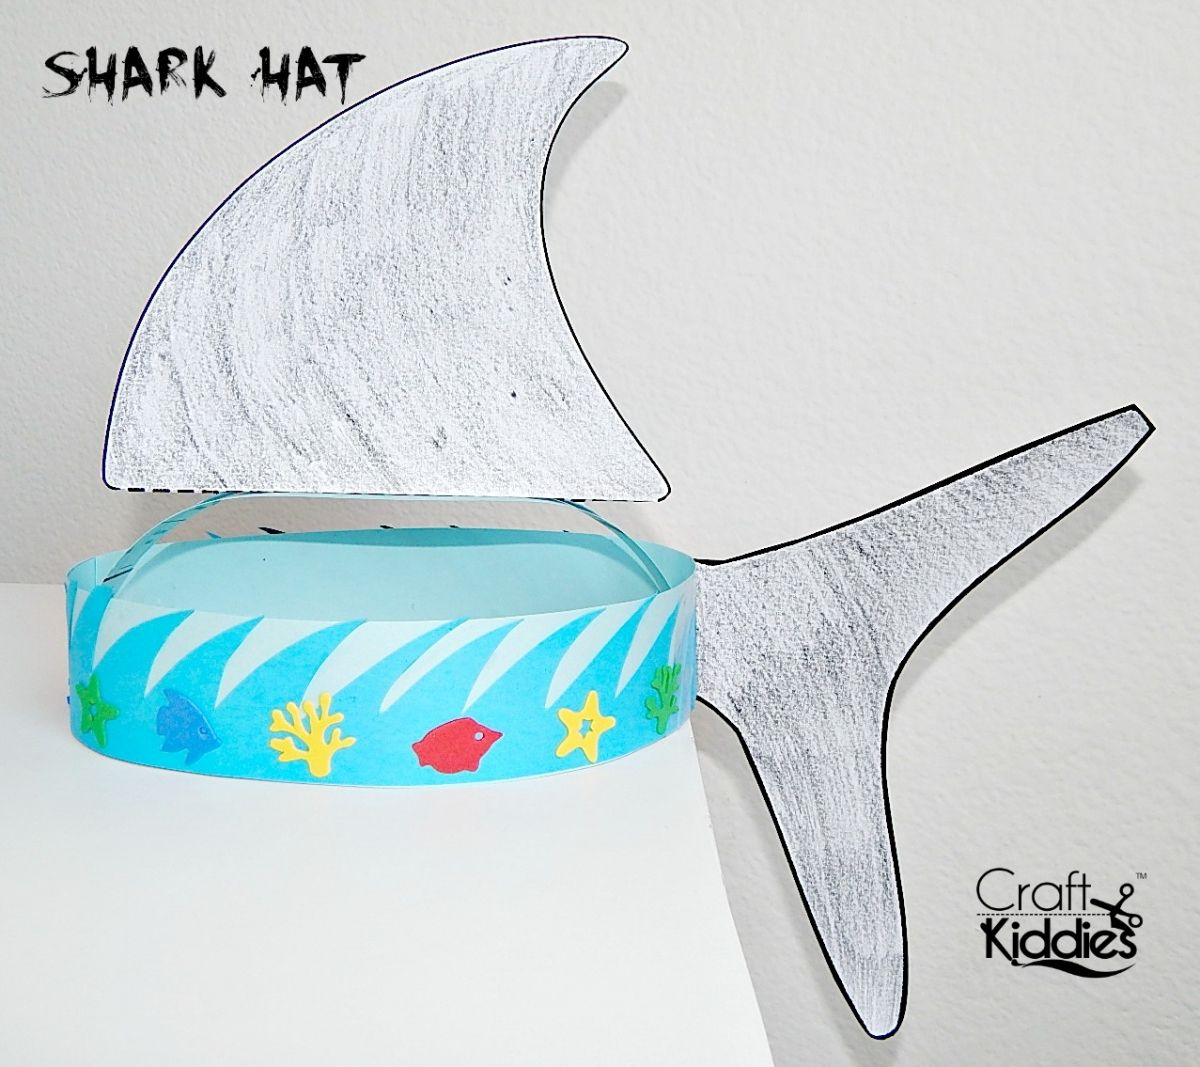 how to make imitation shark fin